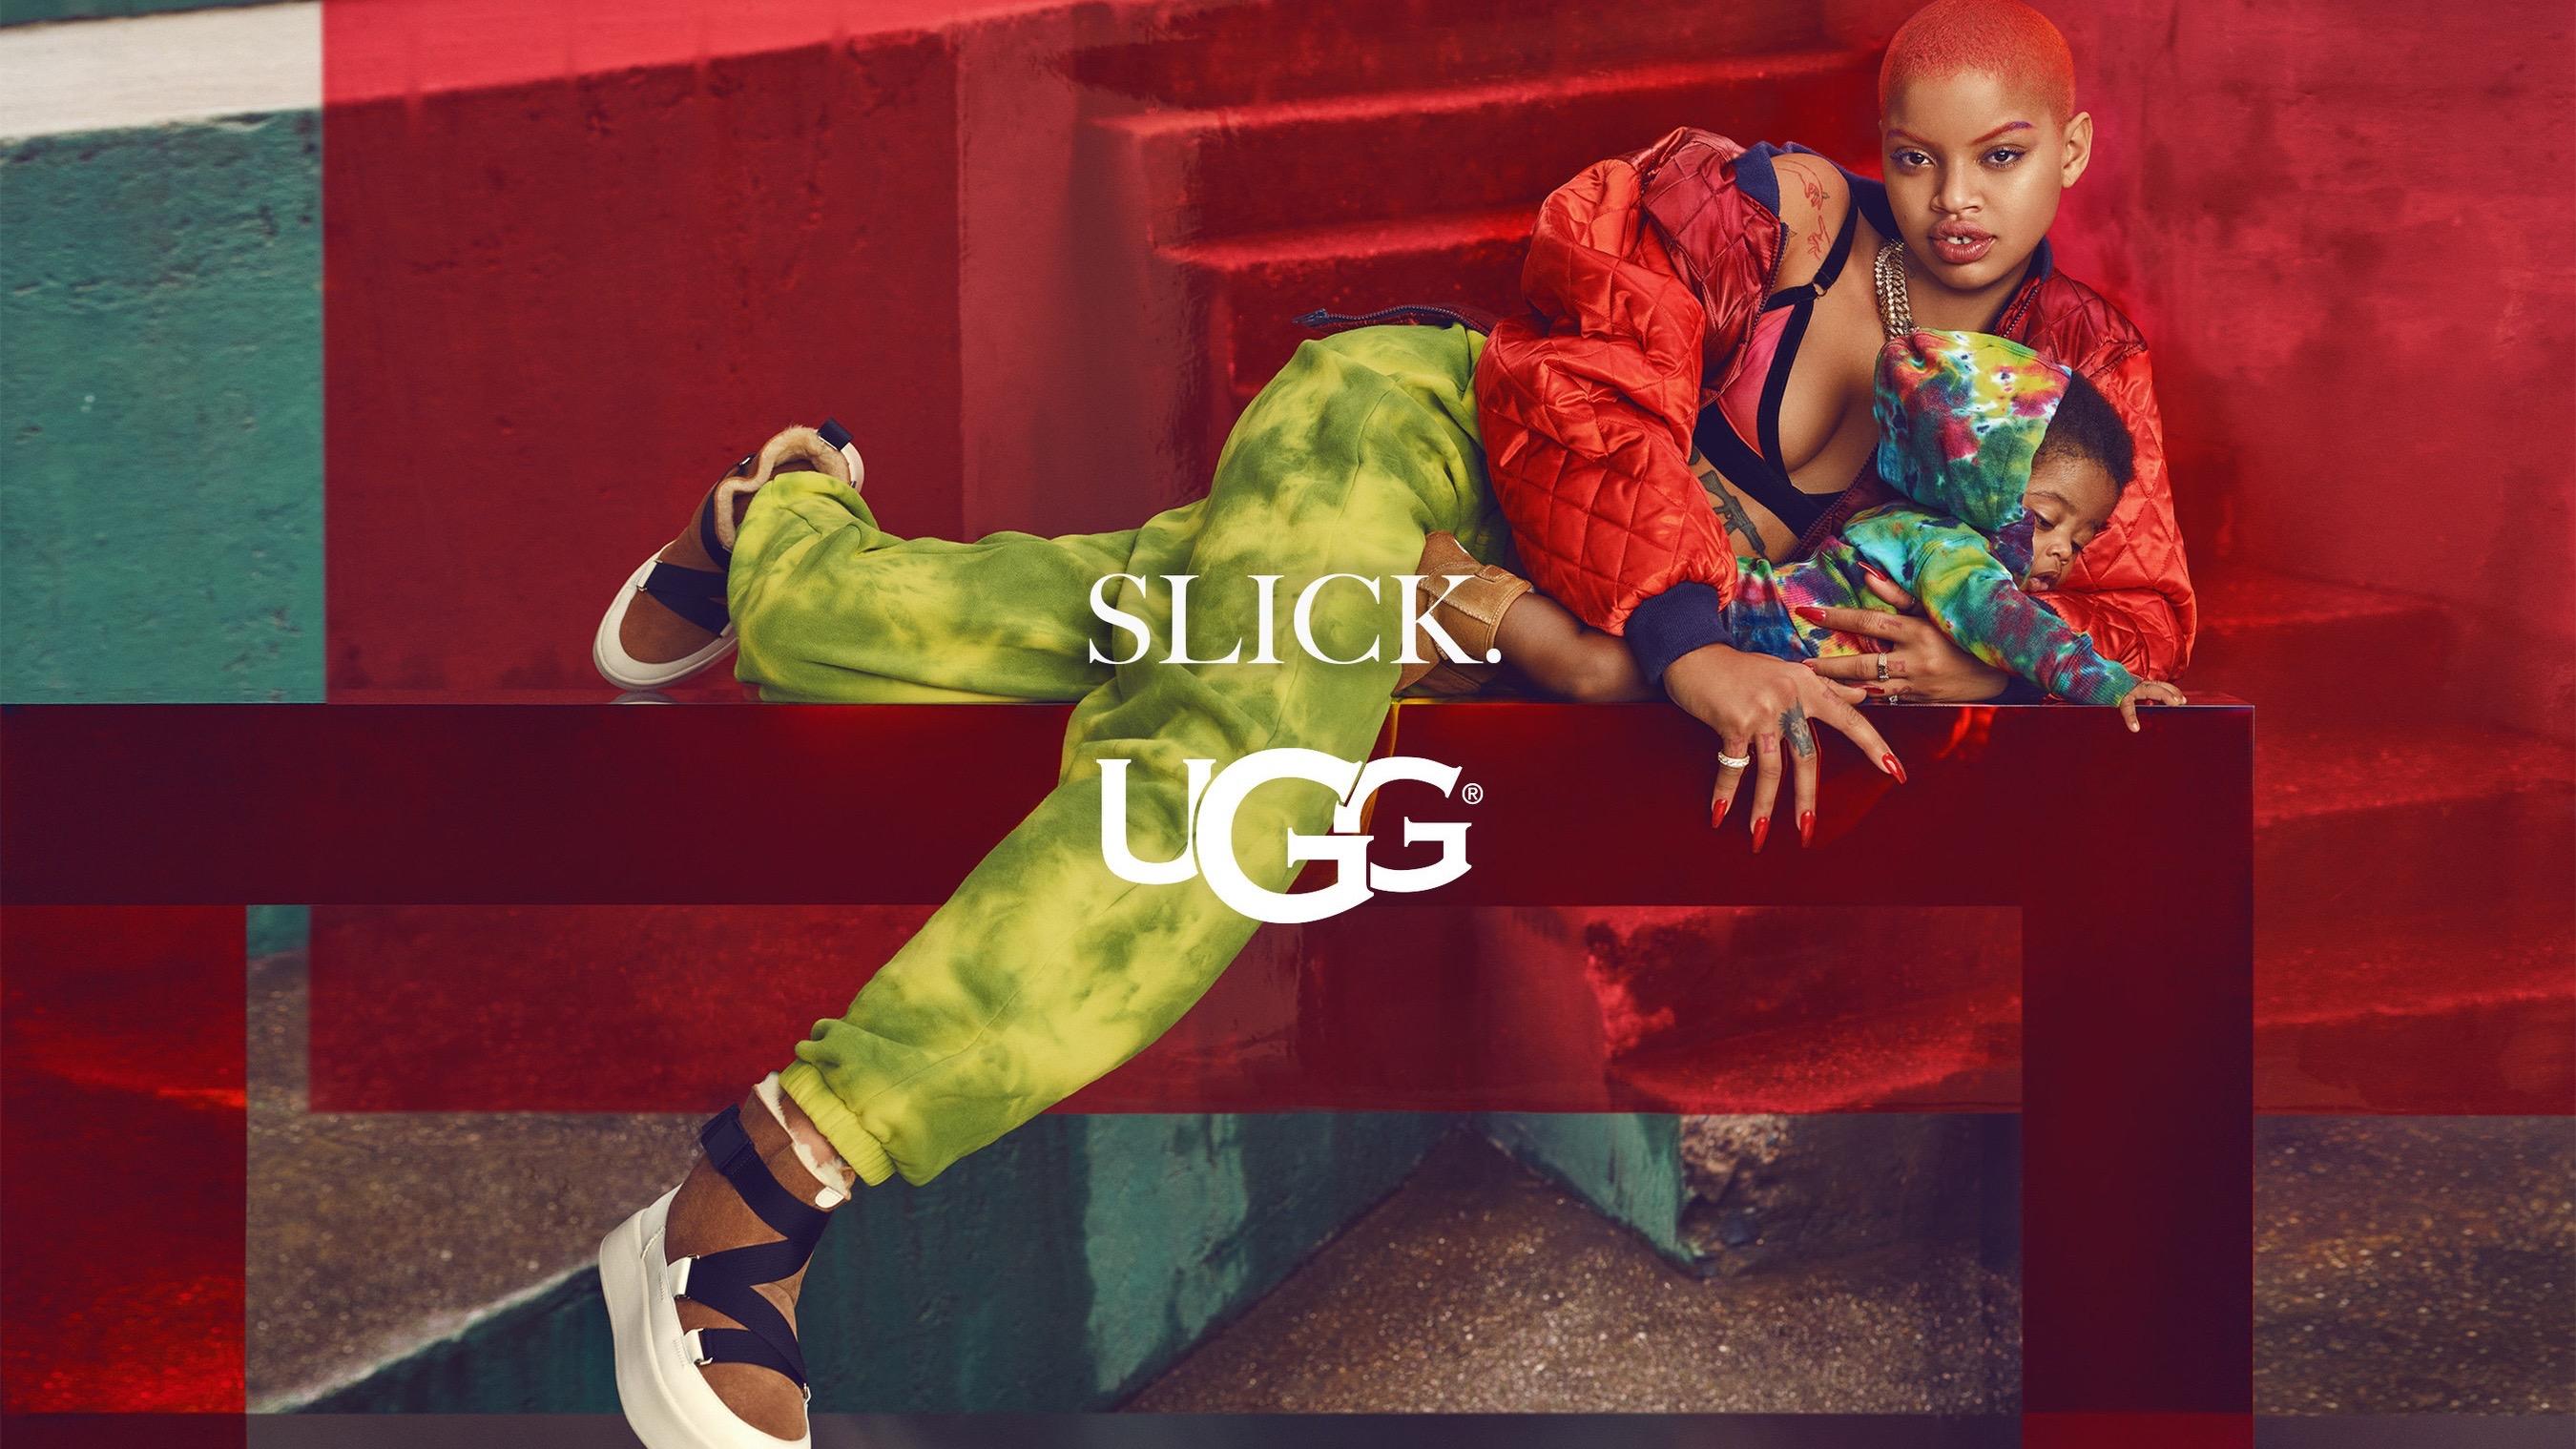 UGG Autumn Winter 2019 Campaign 1